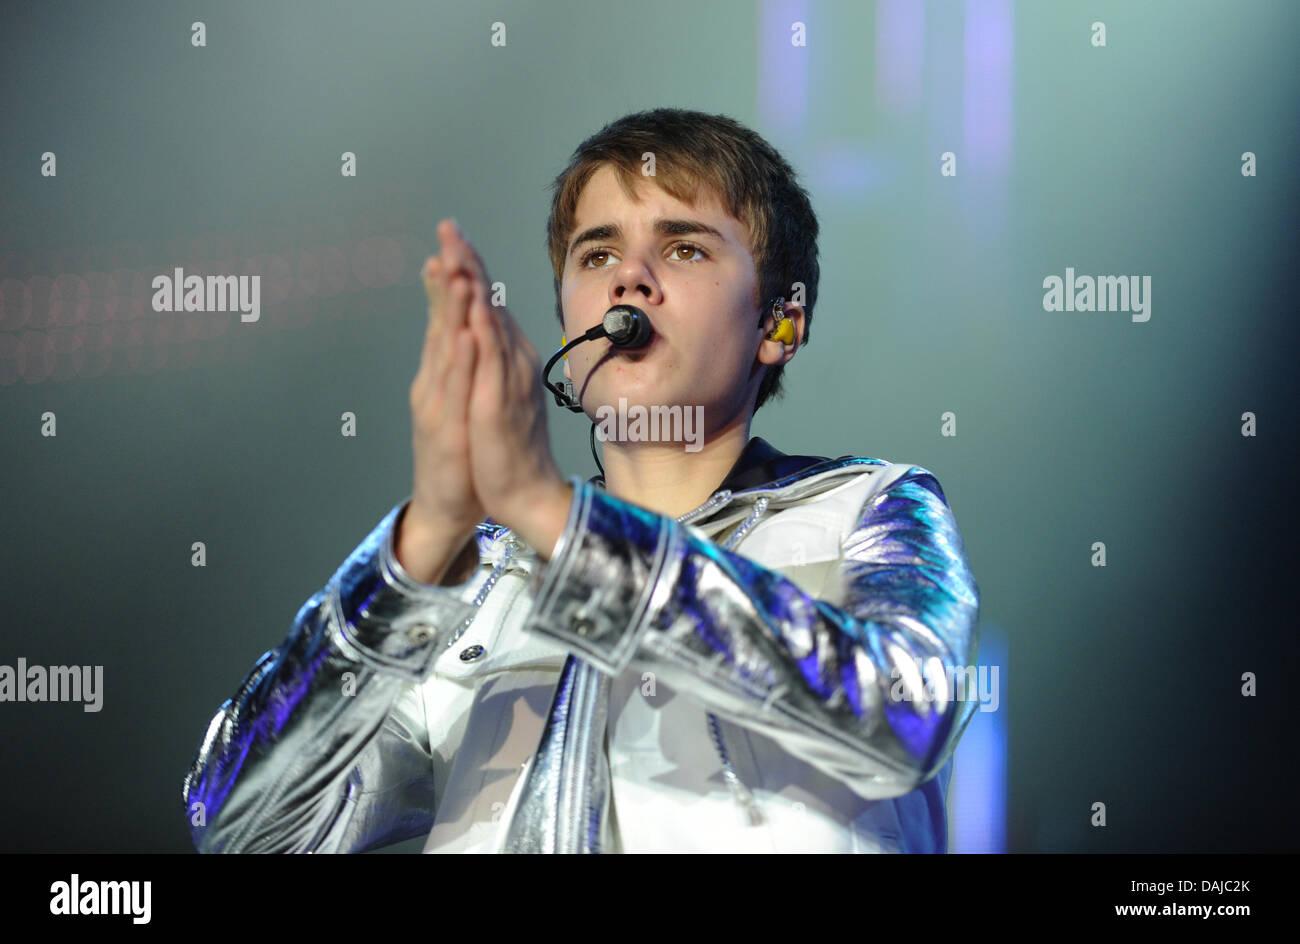 Qui est Justin Bieber datant maintenant 2013